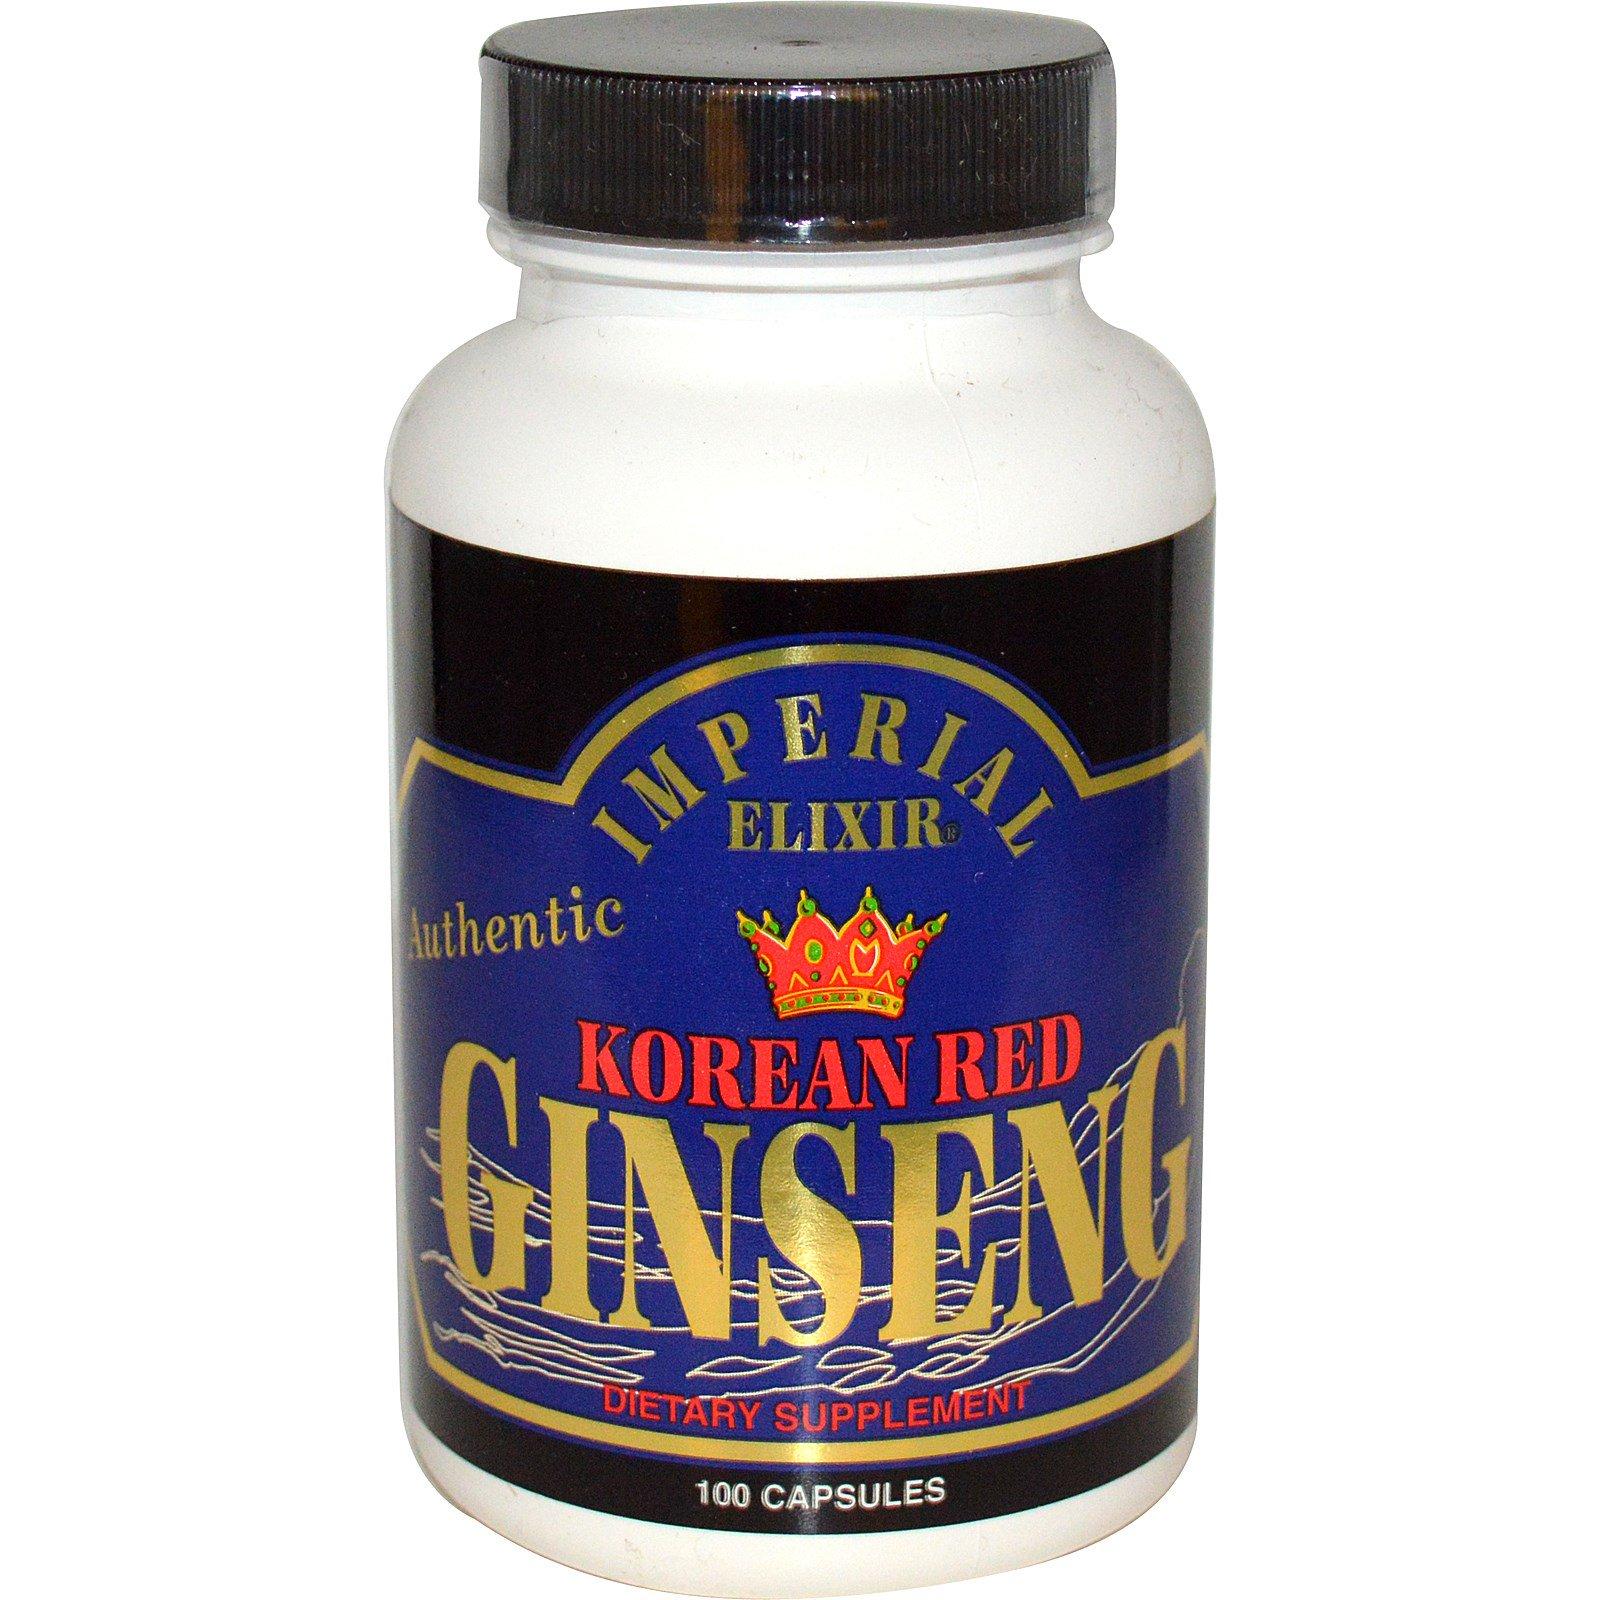 Imperial Elixir, Korean Red Ginseng, 100 Capsules - iHerb.com